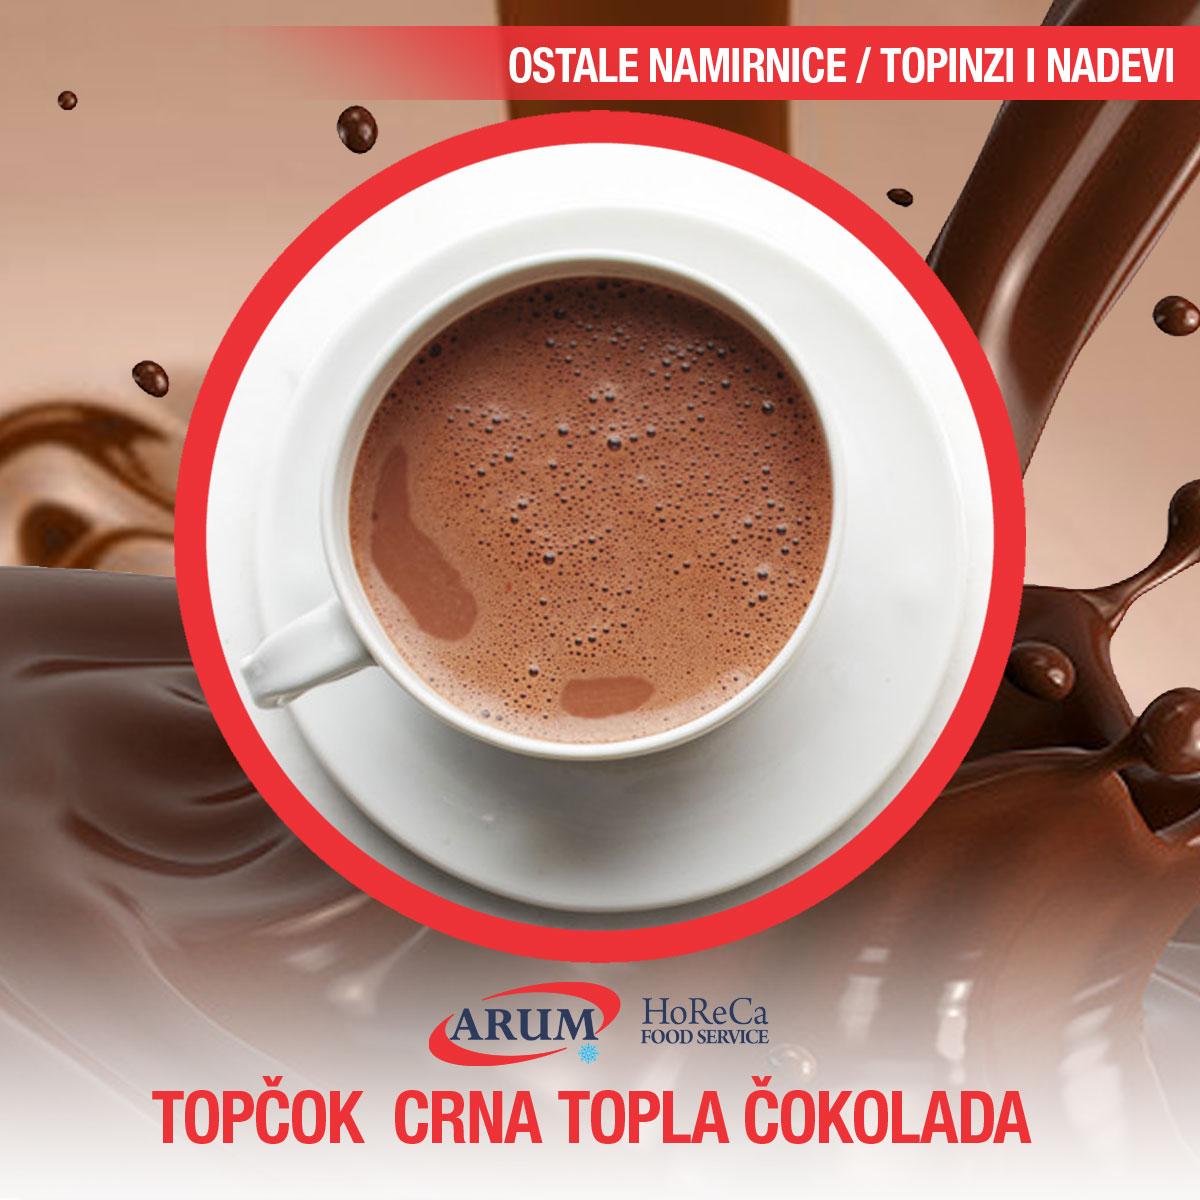 Top cok crna topla cokolada25g kesica (20 kom)